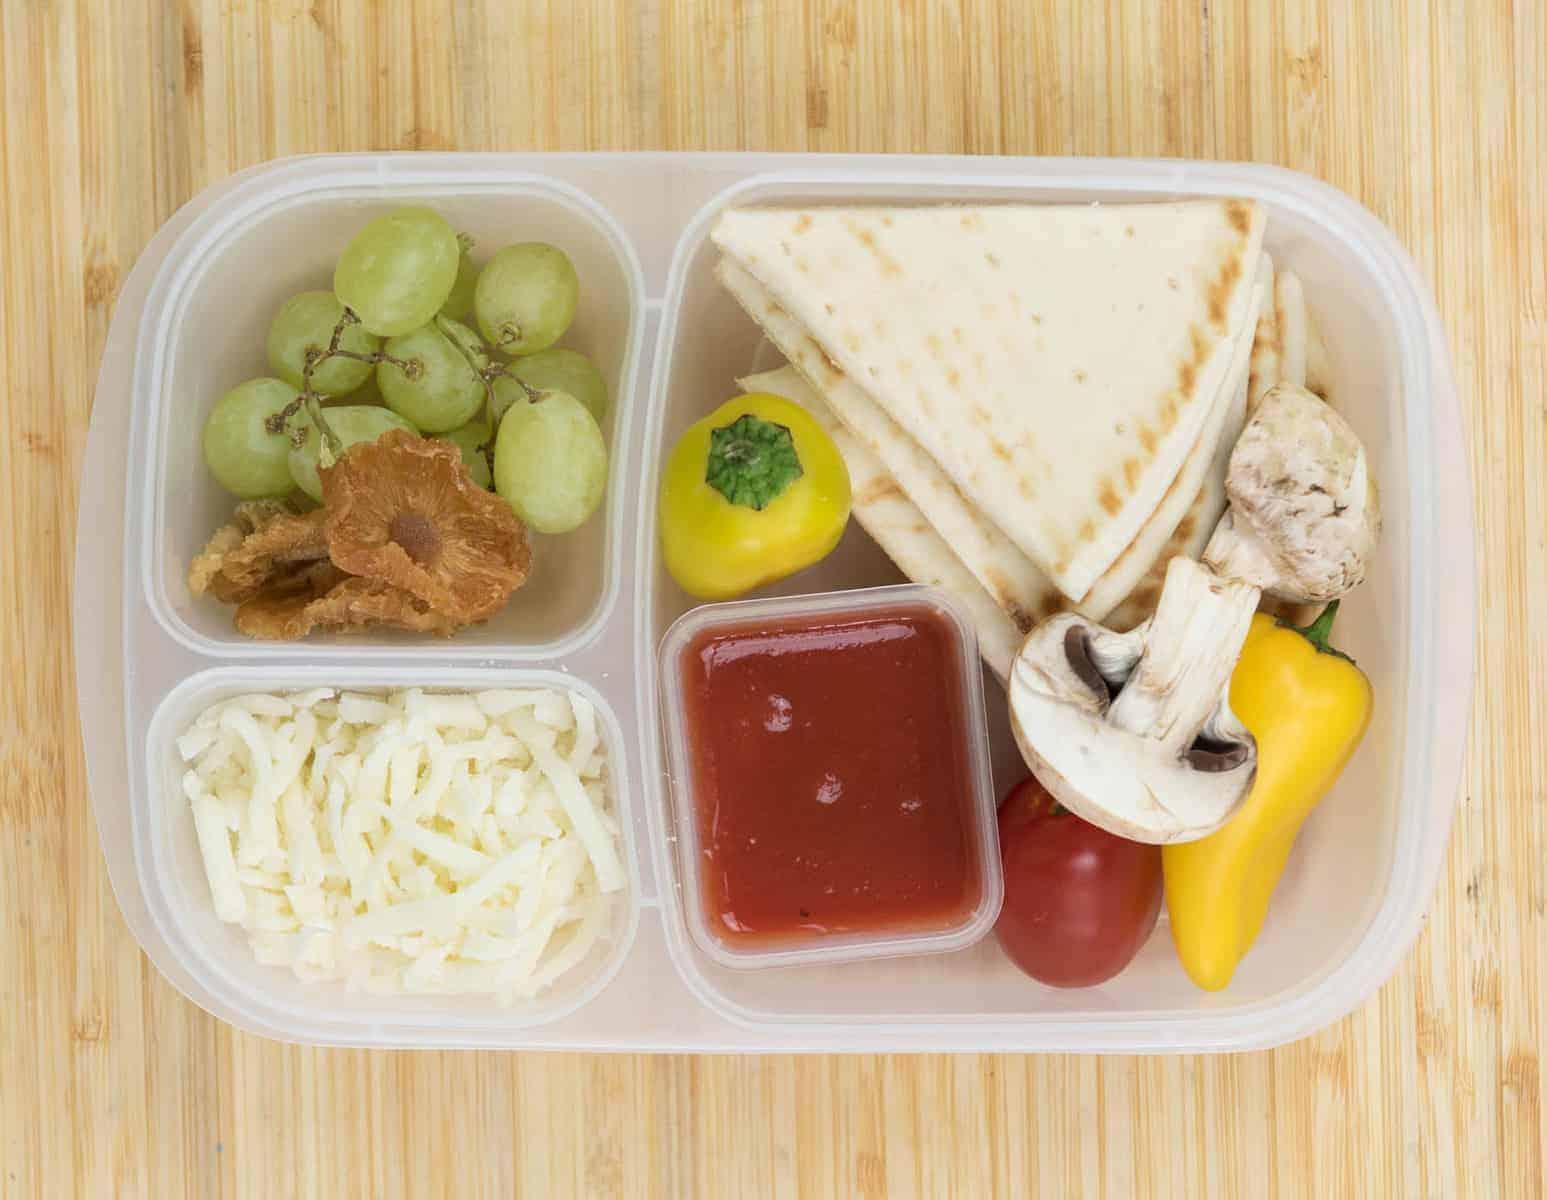 Lunch Box Ideas - DIY Pizza Kit Lunch Box